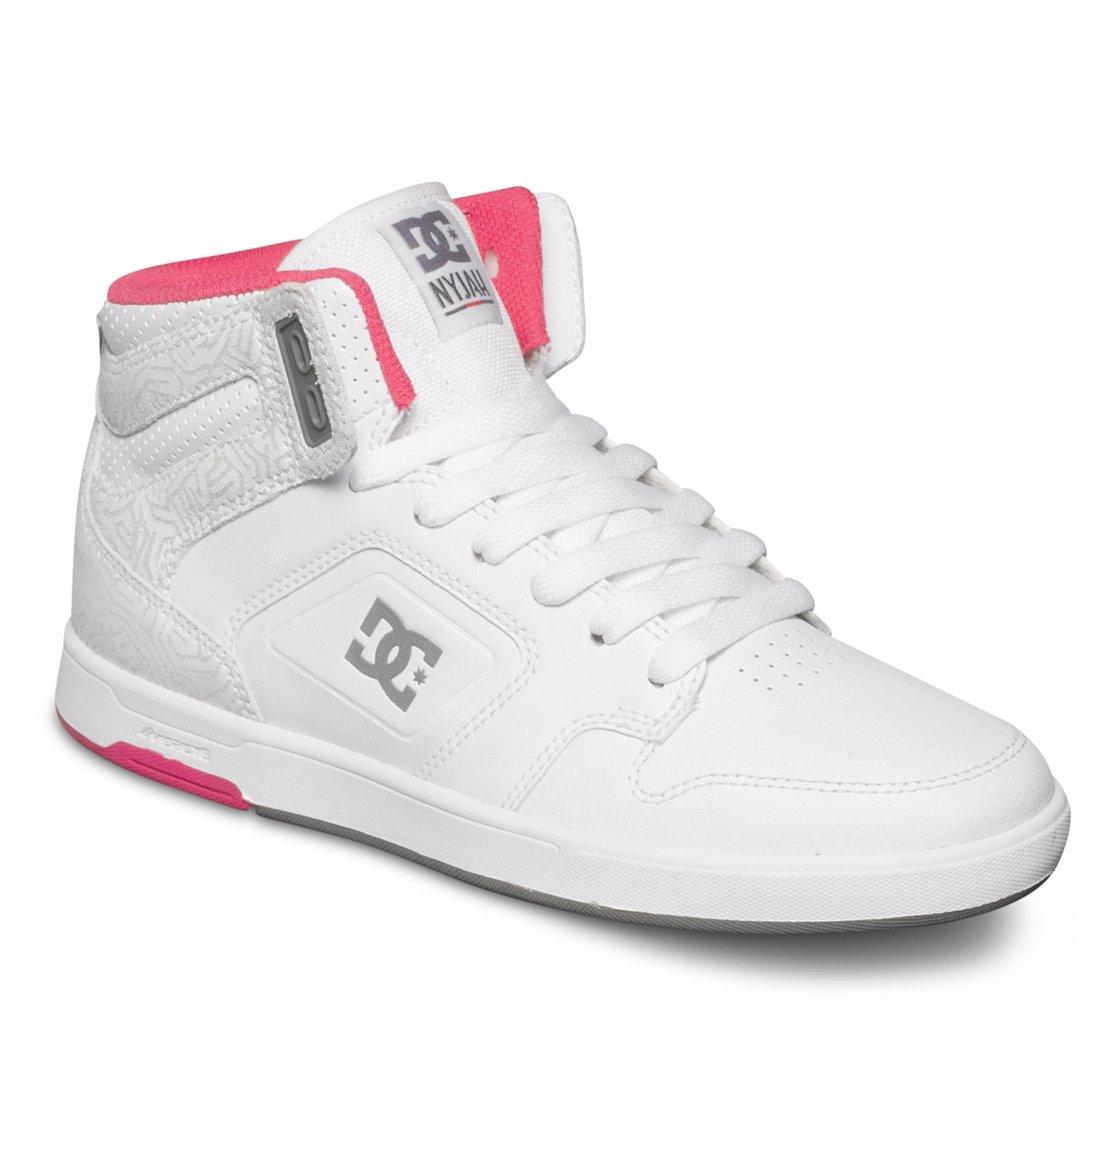 s nyjah high top shoes adjs100048 dc shoes